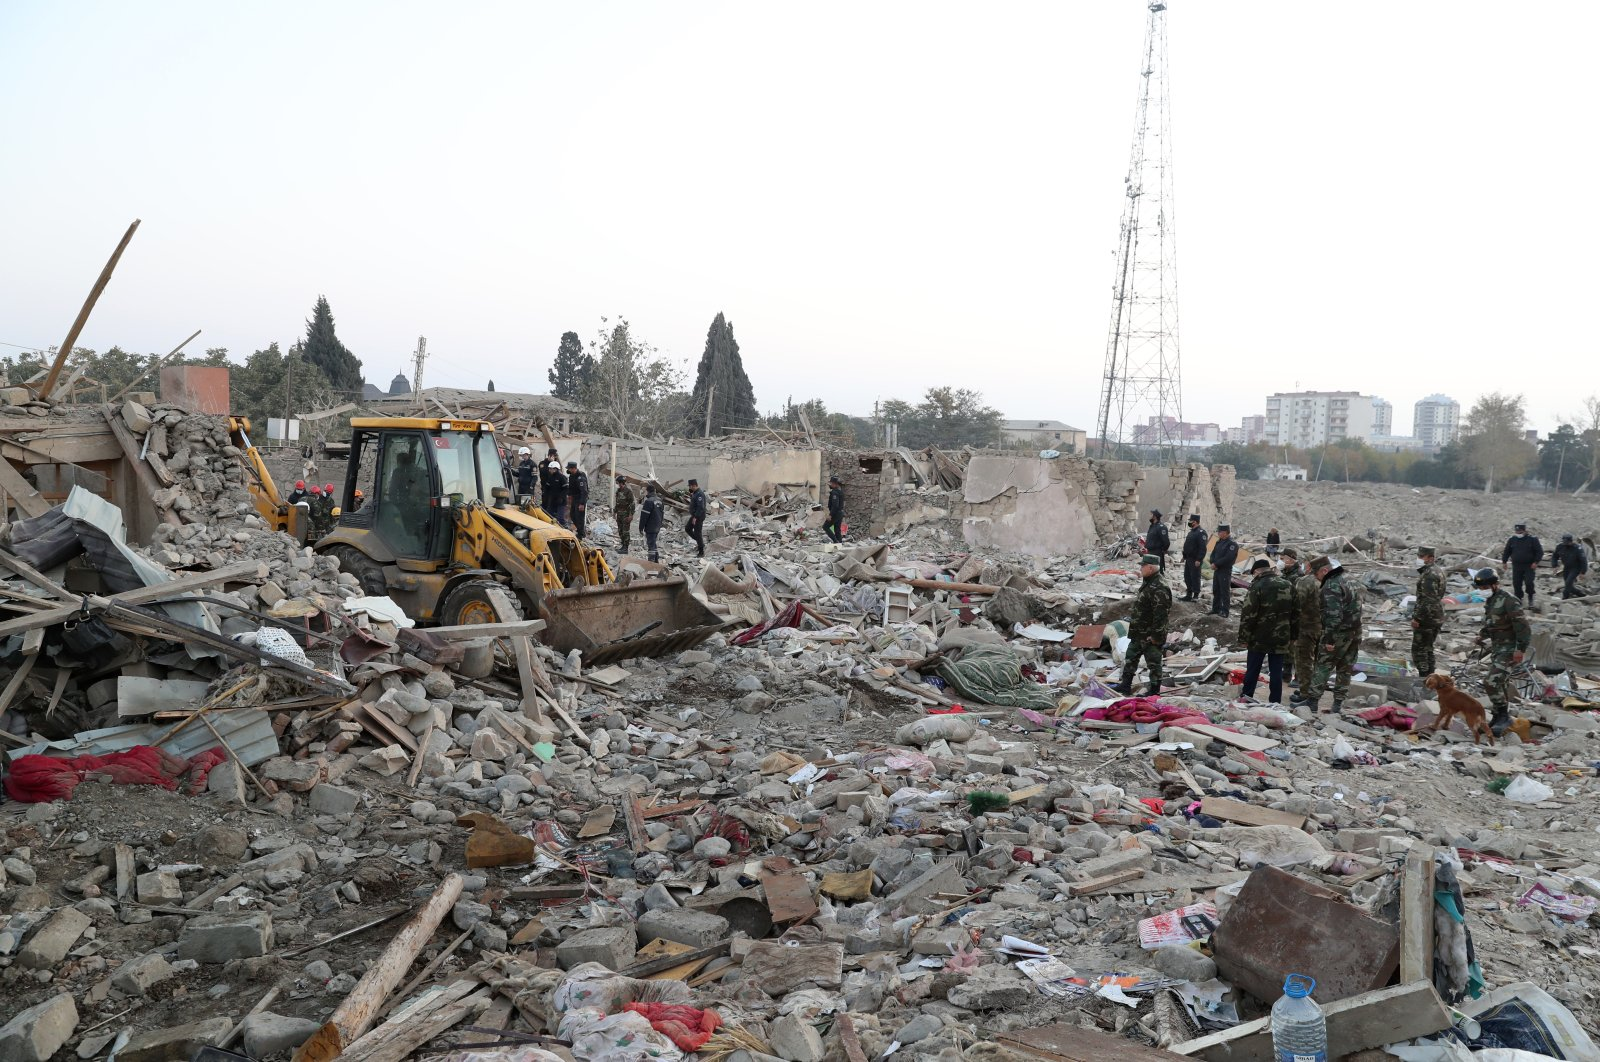 Azerbaijani rescuers work on the devastated houses damaged by recent shelling in Ganja, Azerbaijan, 17 Oct. 2020. (EPA Photo)